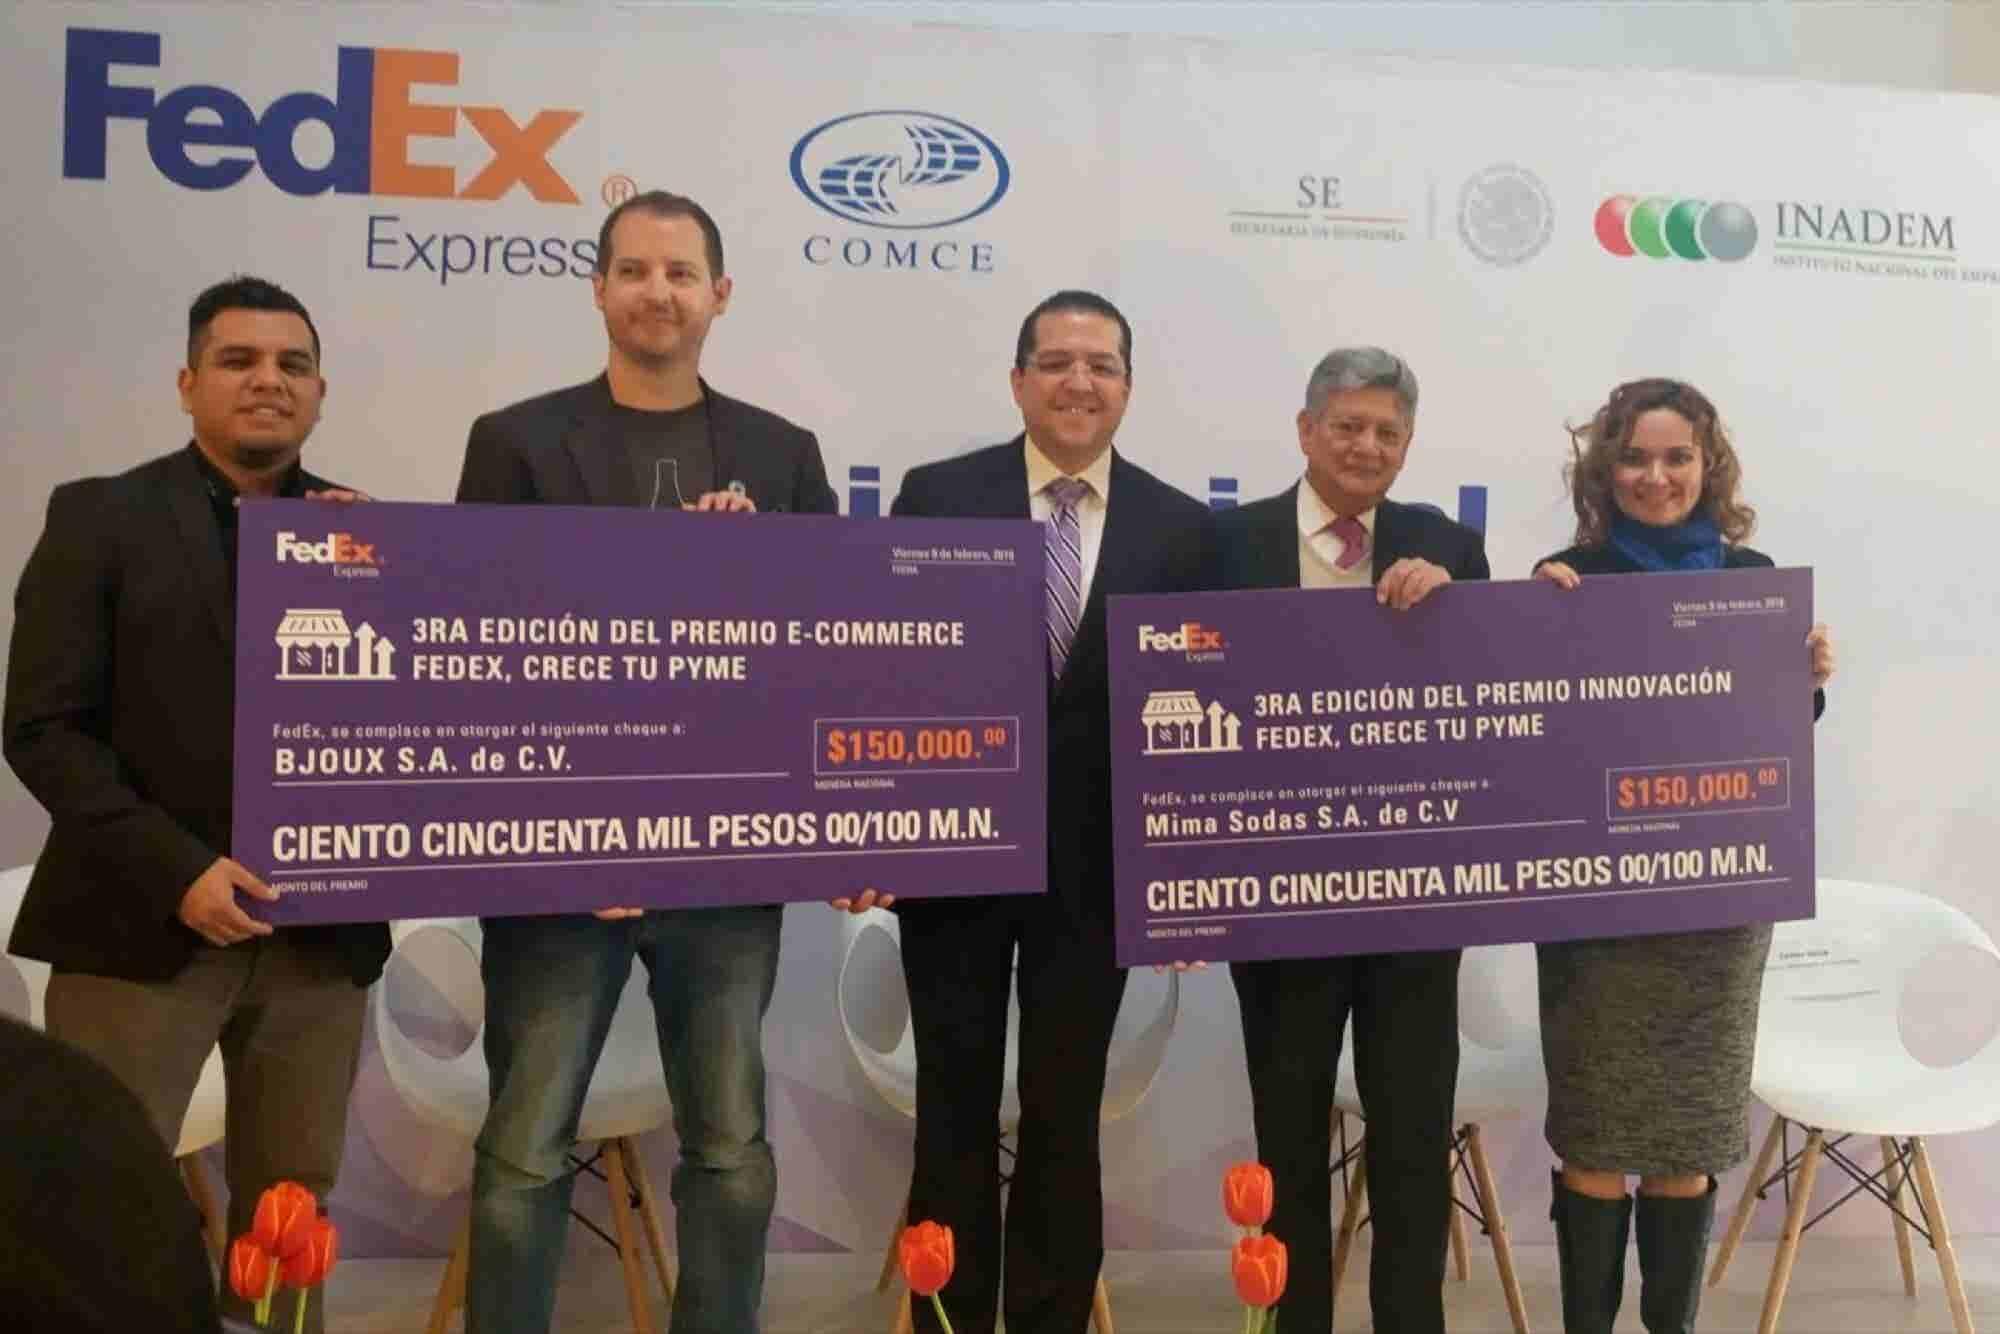 INADEM y FedEx premian a dos Pymes innovadoras